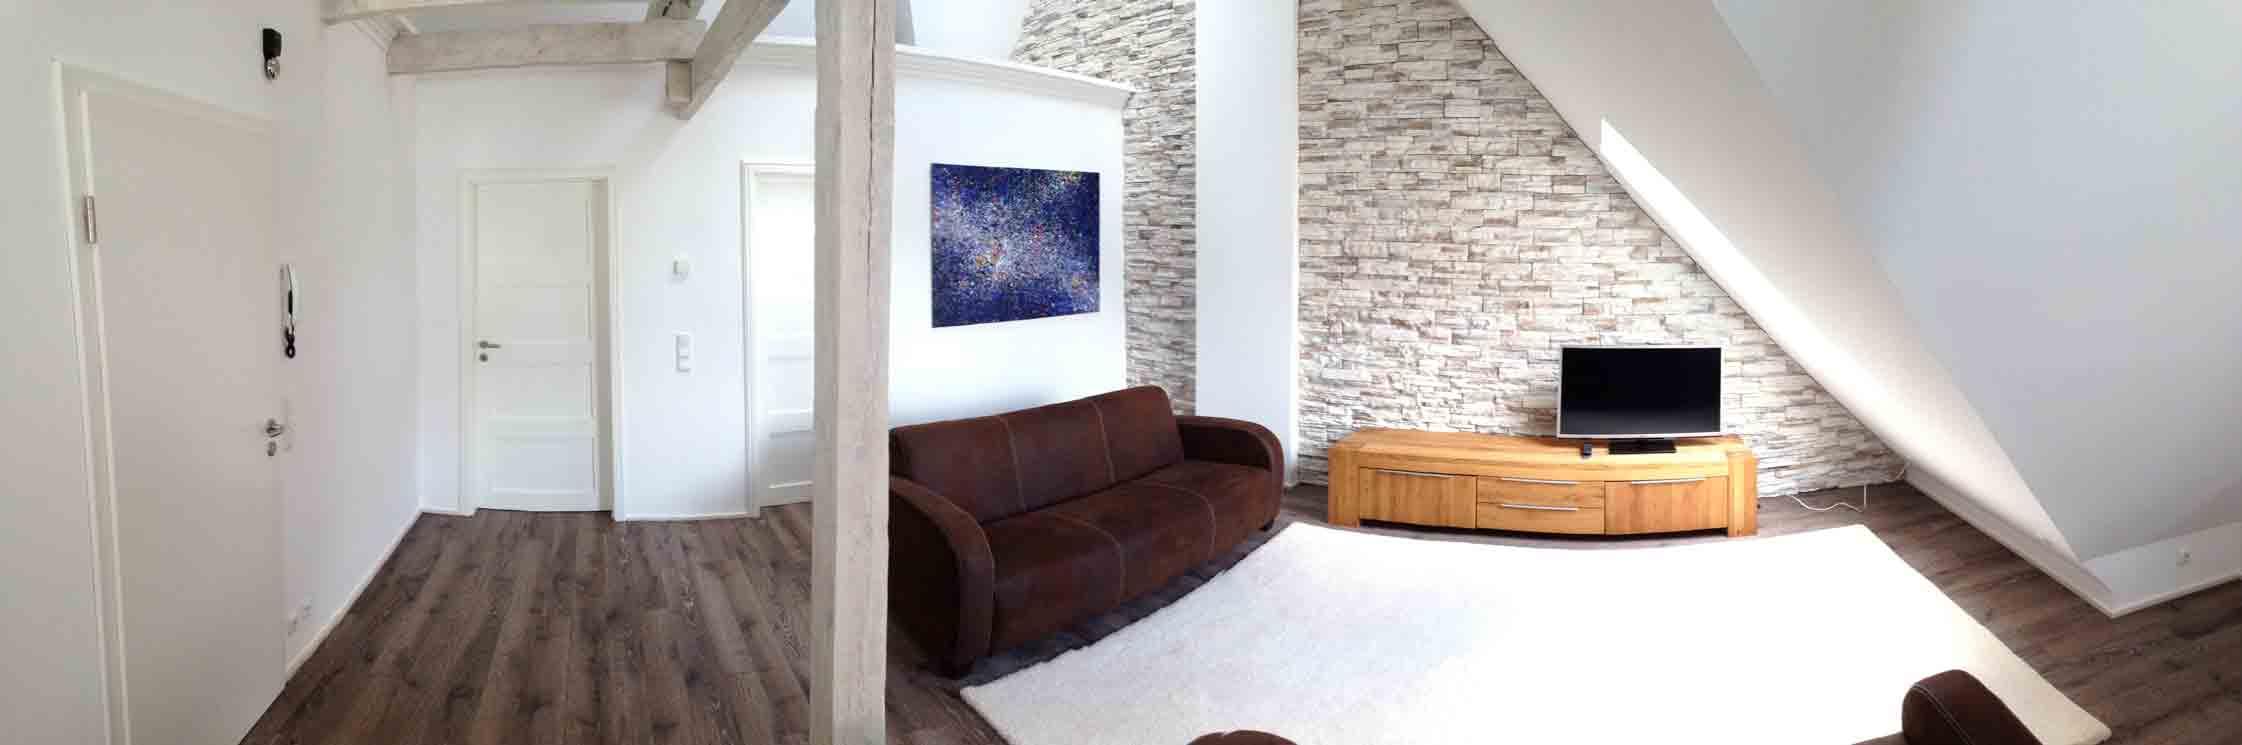 Cuxcloudferienwhg - Panoramabild schlafzimmer ...